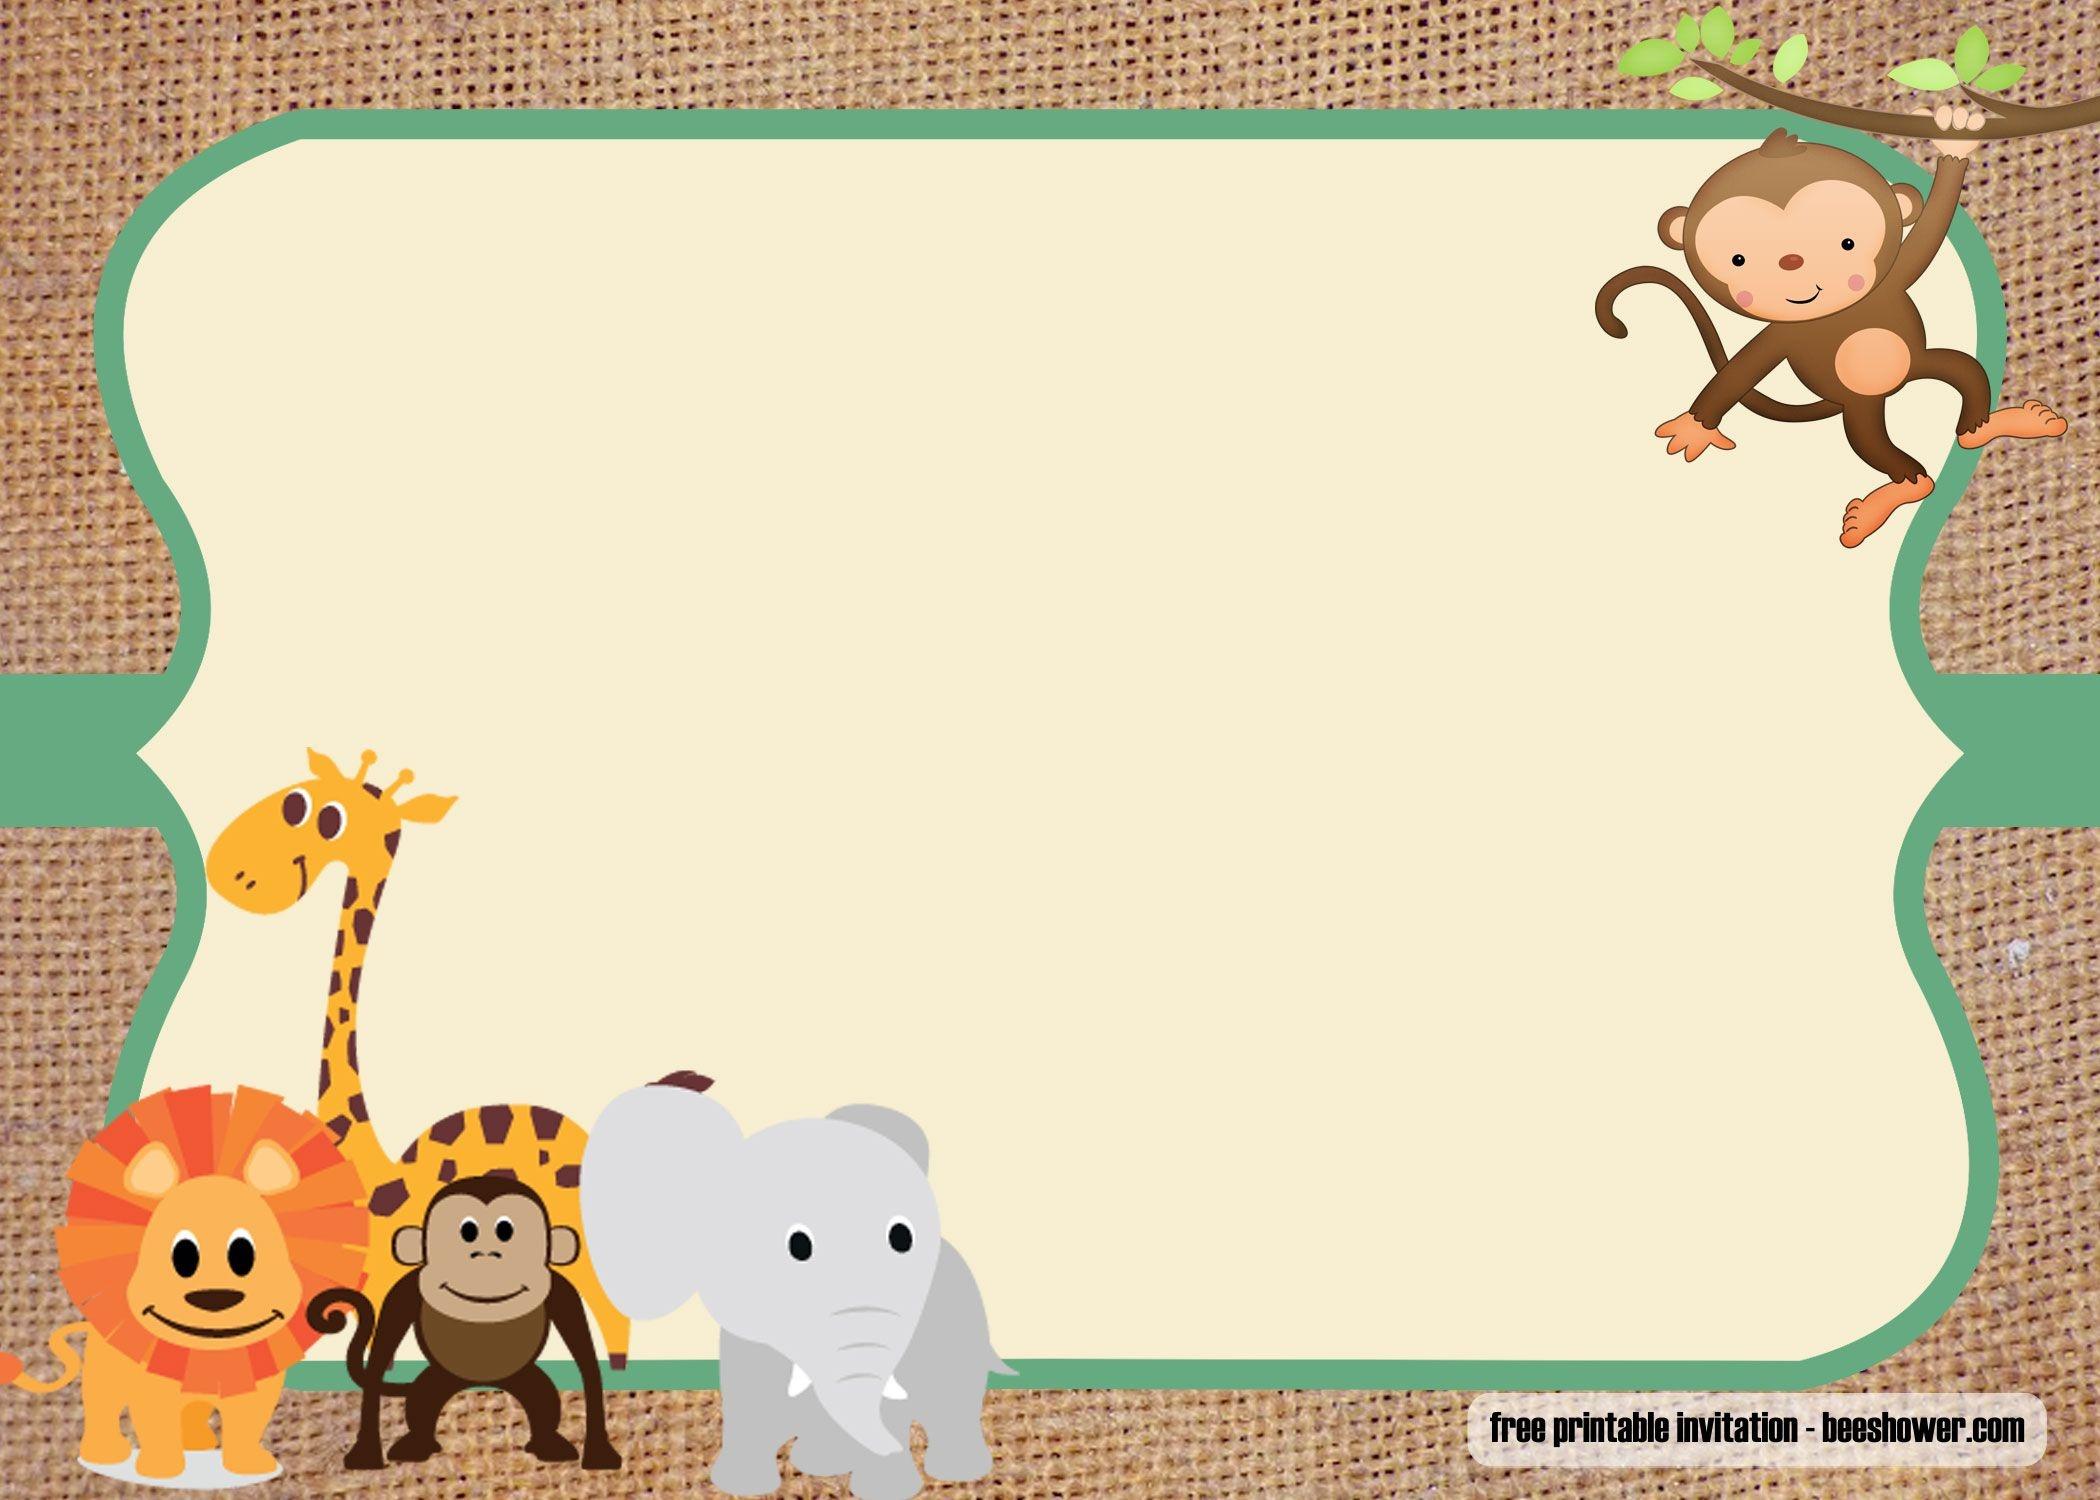 Free Safari Theme Baby Shower Invitations Templates | Free Printable - Free Printable Jungle Safari Baby Shower Invitations